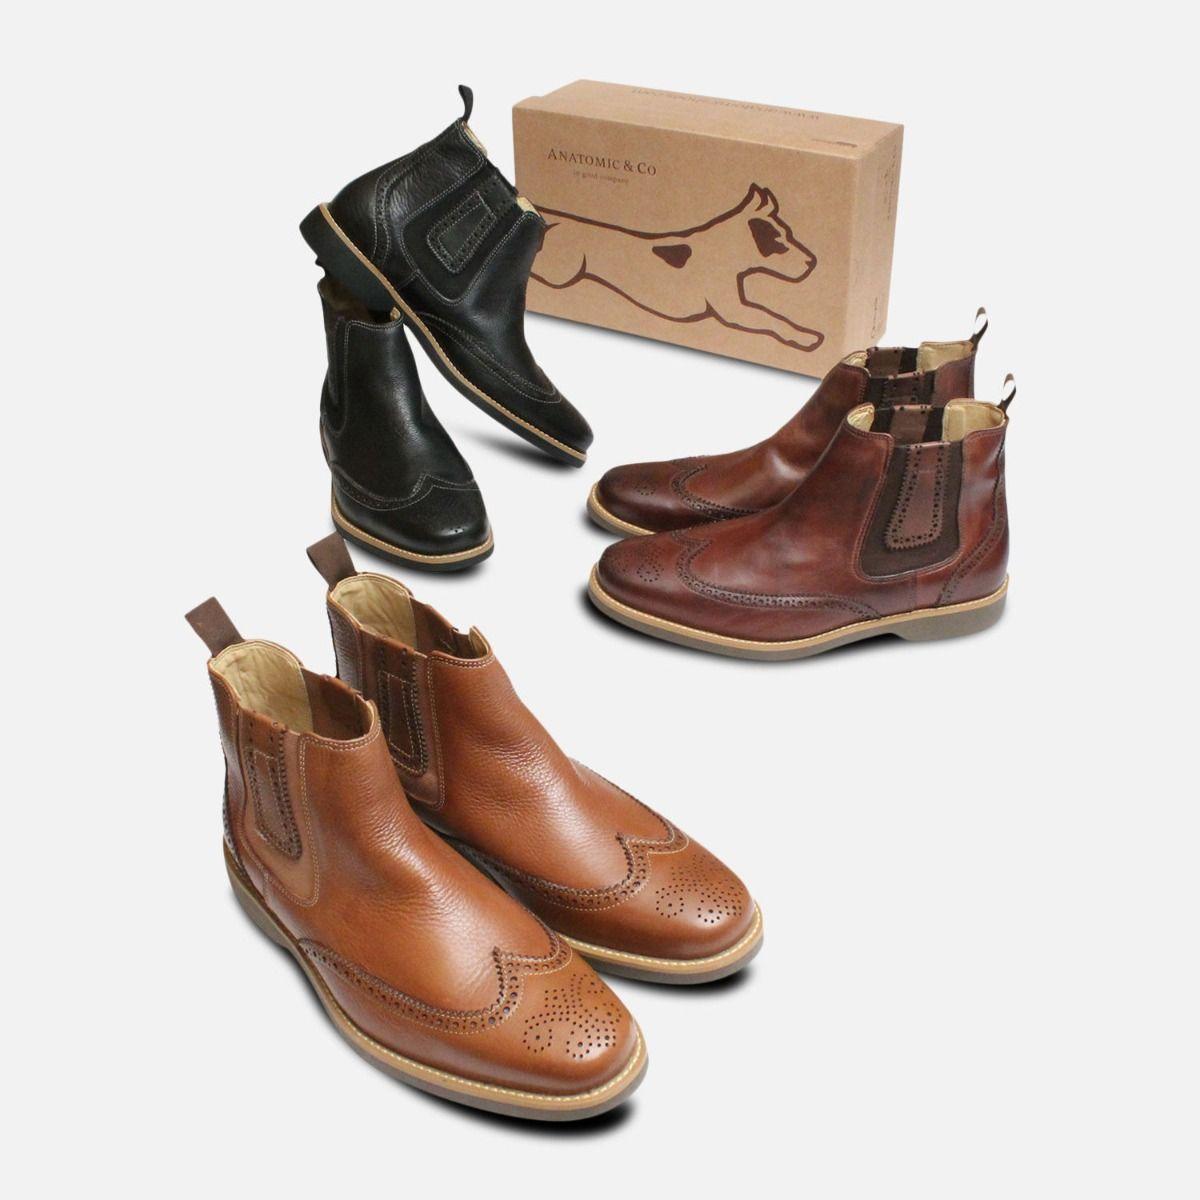 Antiqued Wingcap Brogue Chelsea Boot Anatomic & Co